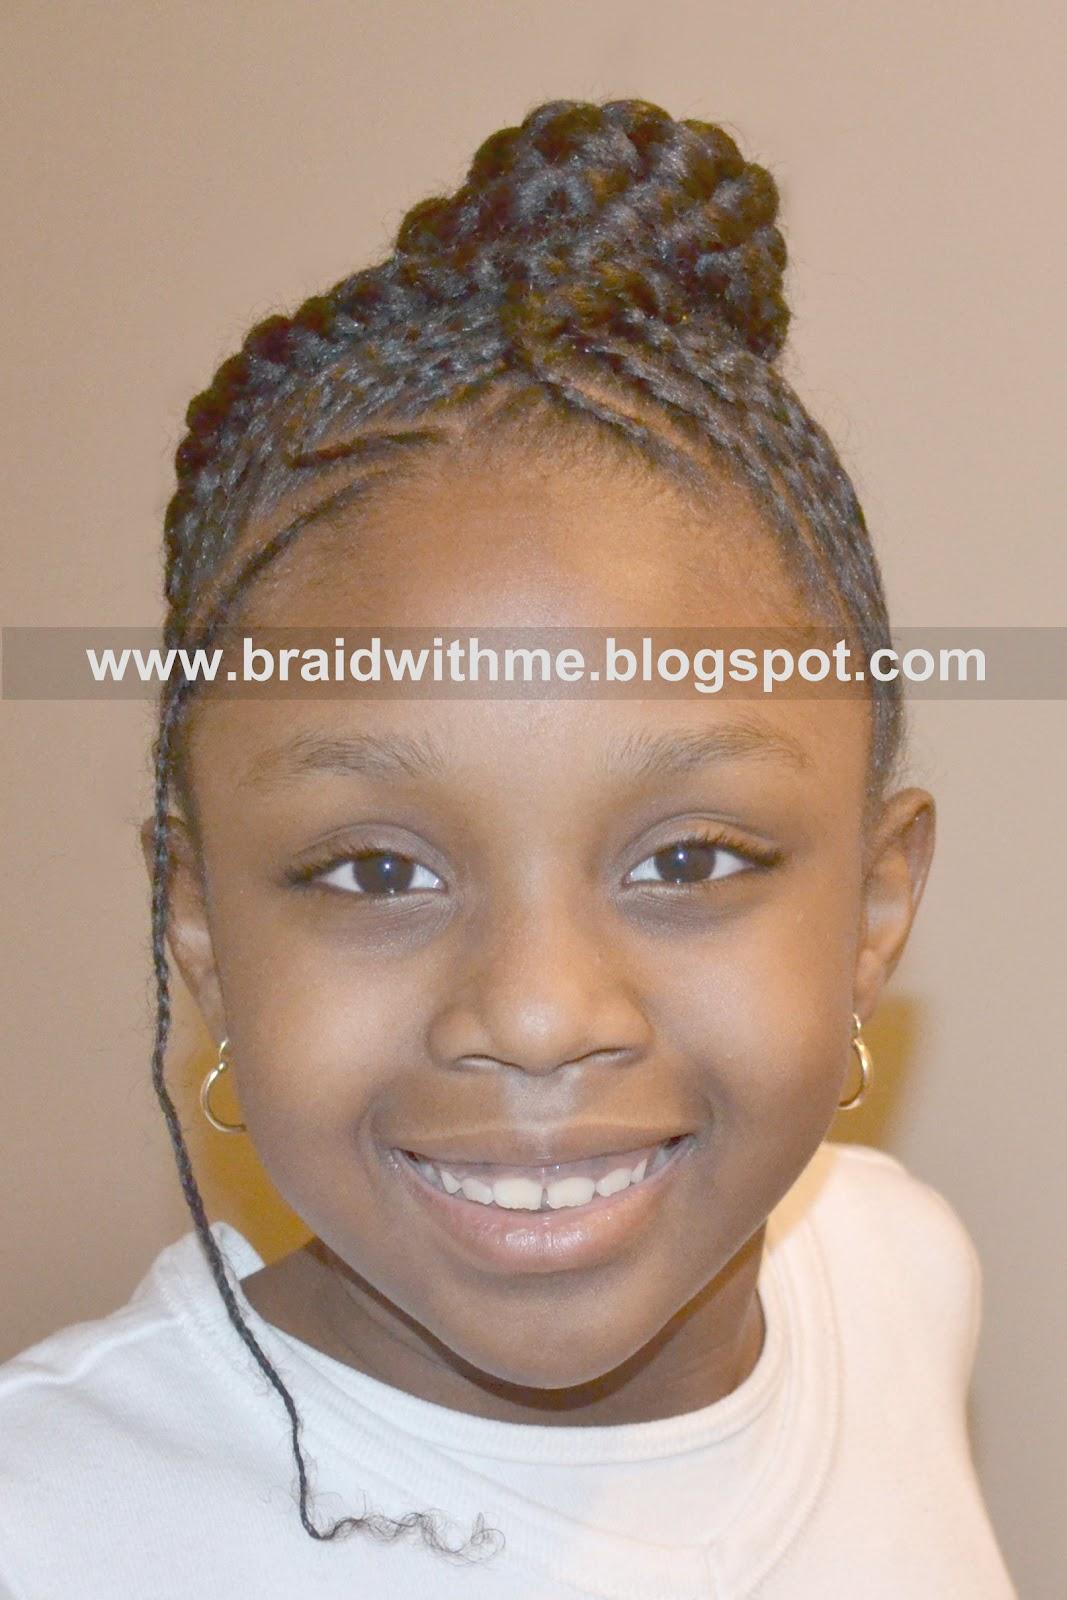 Braided Hairstyles For Short Hair Black Women 1080p Hd Wallpaper